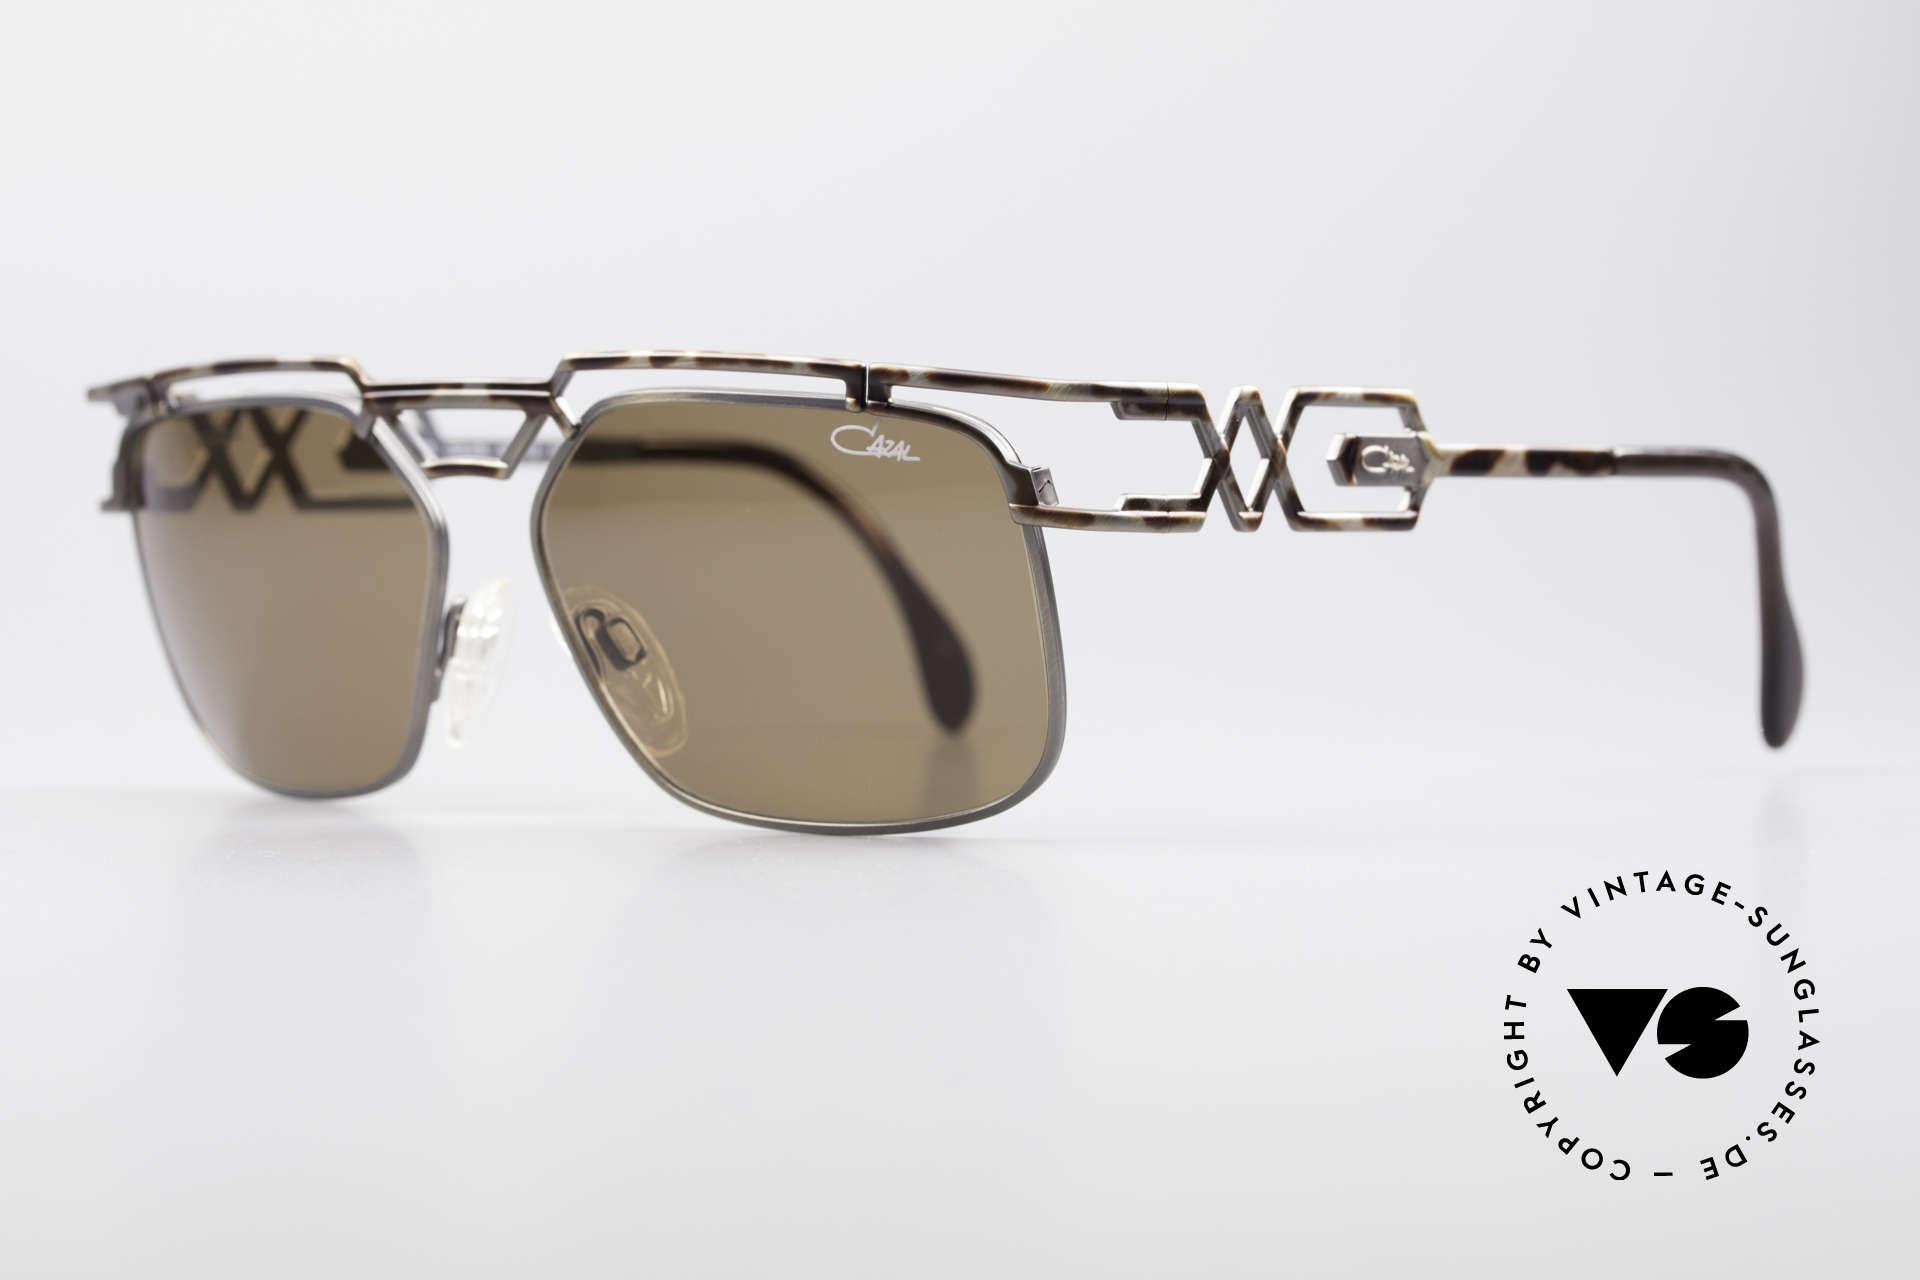 Cazal 973 High-End Designer Sunglasses, elegant & interesting coloring / pattern (antique metal), Made for Men and Women